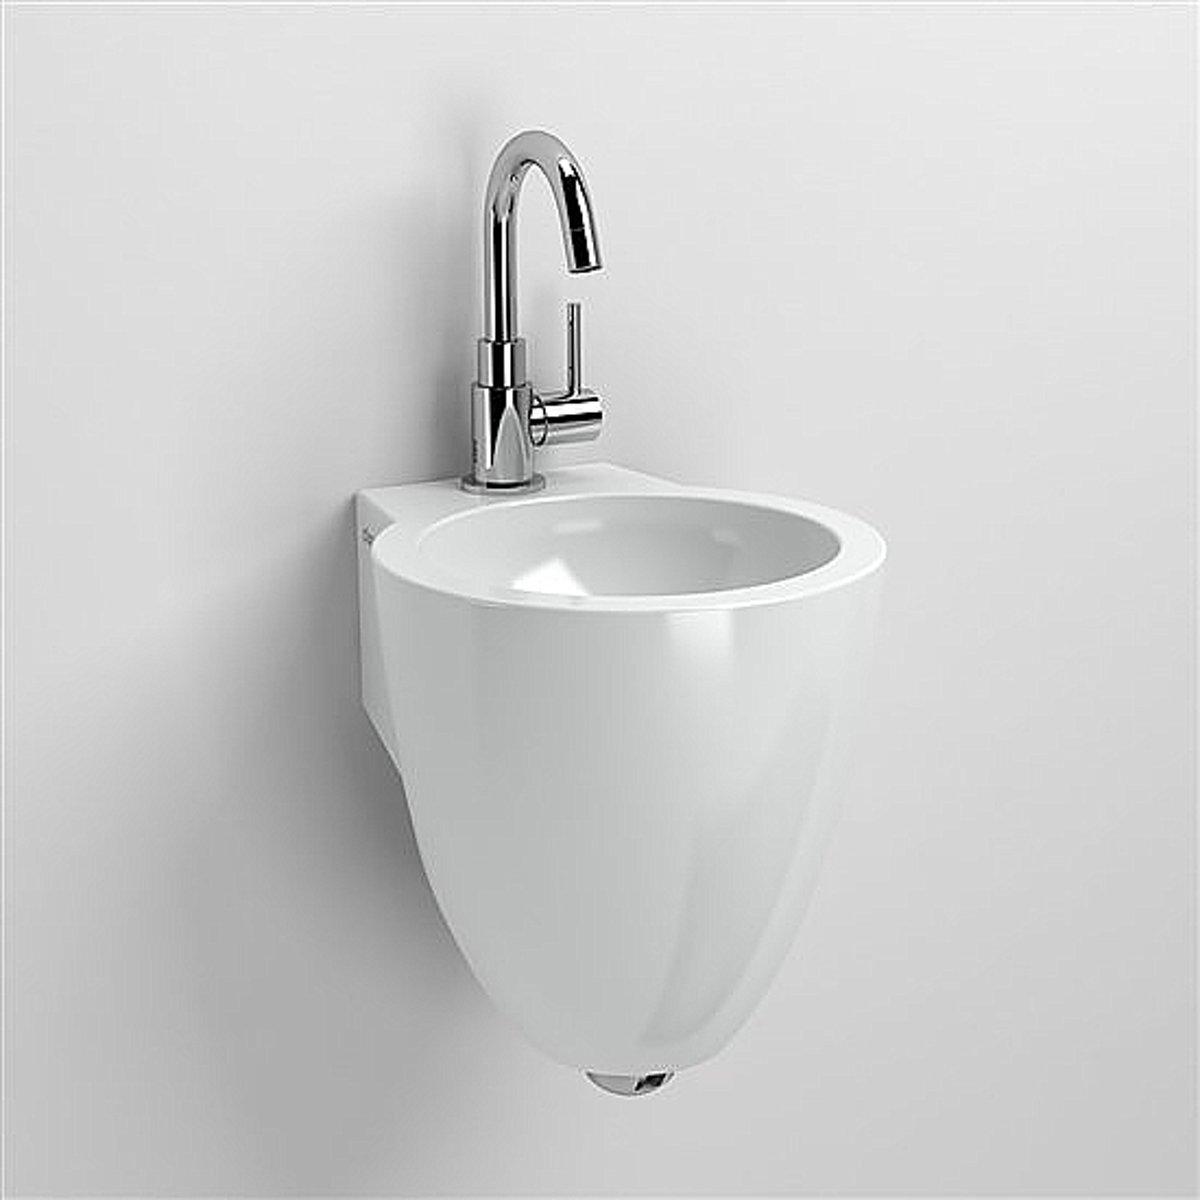 Mini Fontein Toilet.Bol Com Clou Fontein Kopen Alle Fonteinen Online